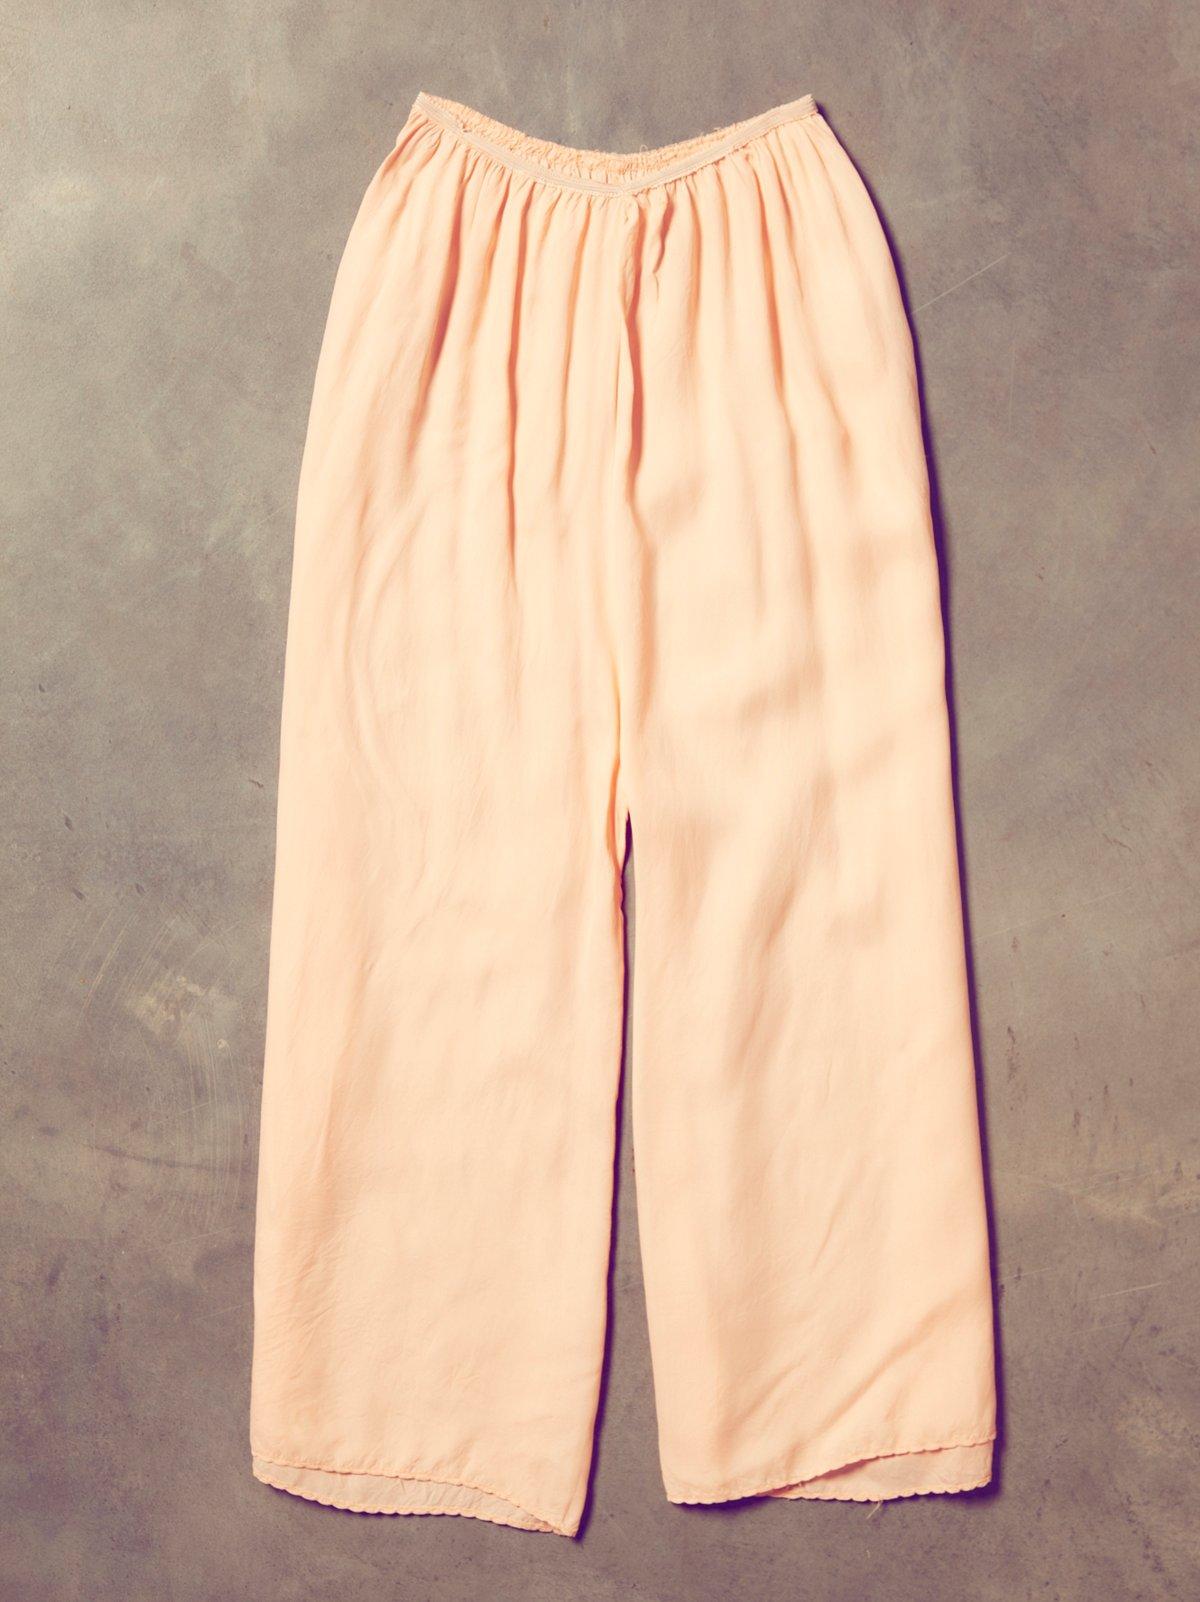 Vintage 1950s Lounge Pant